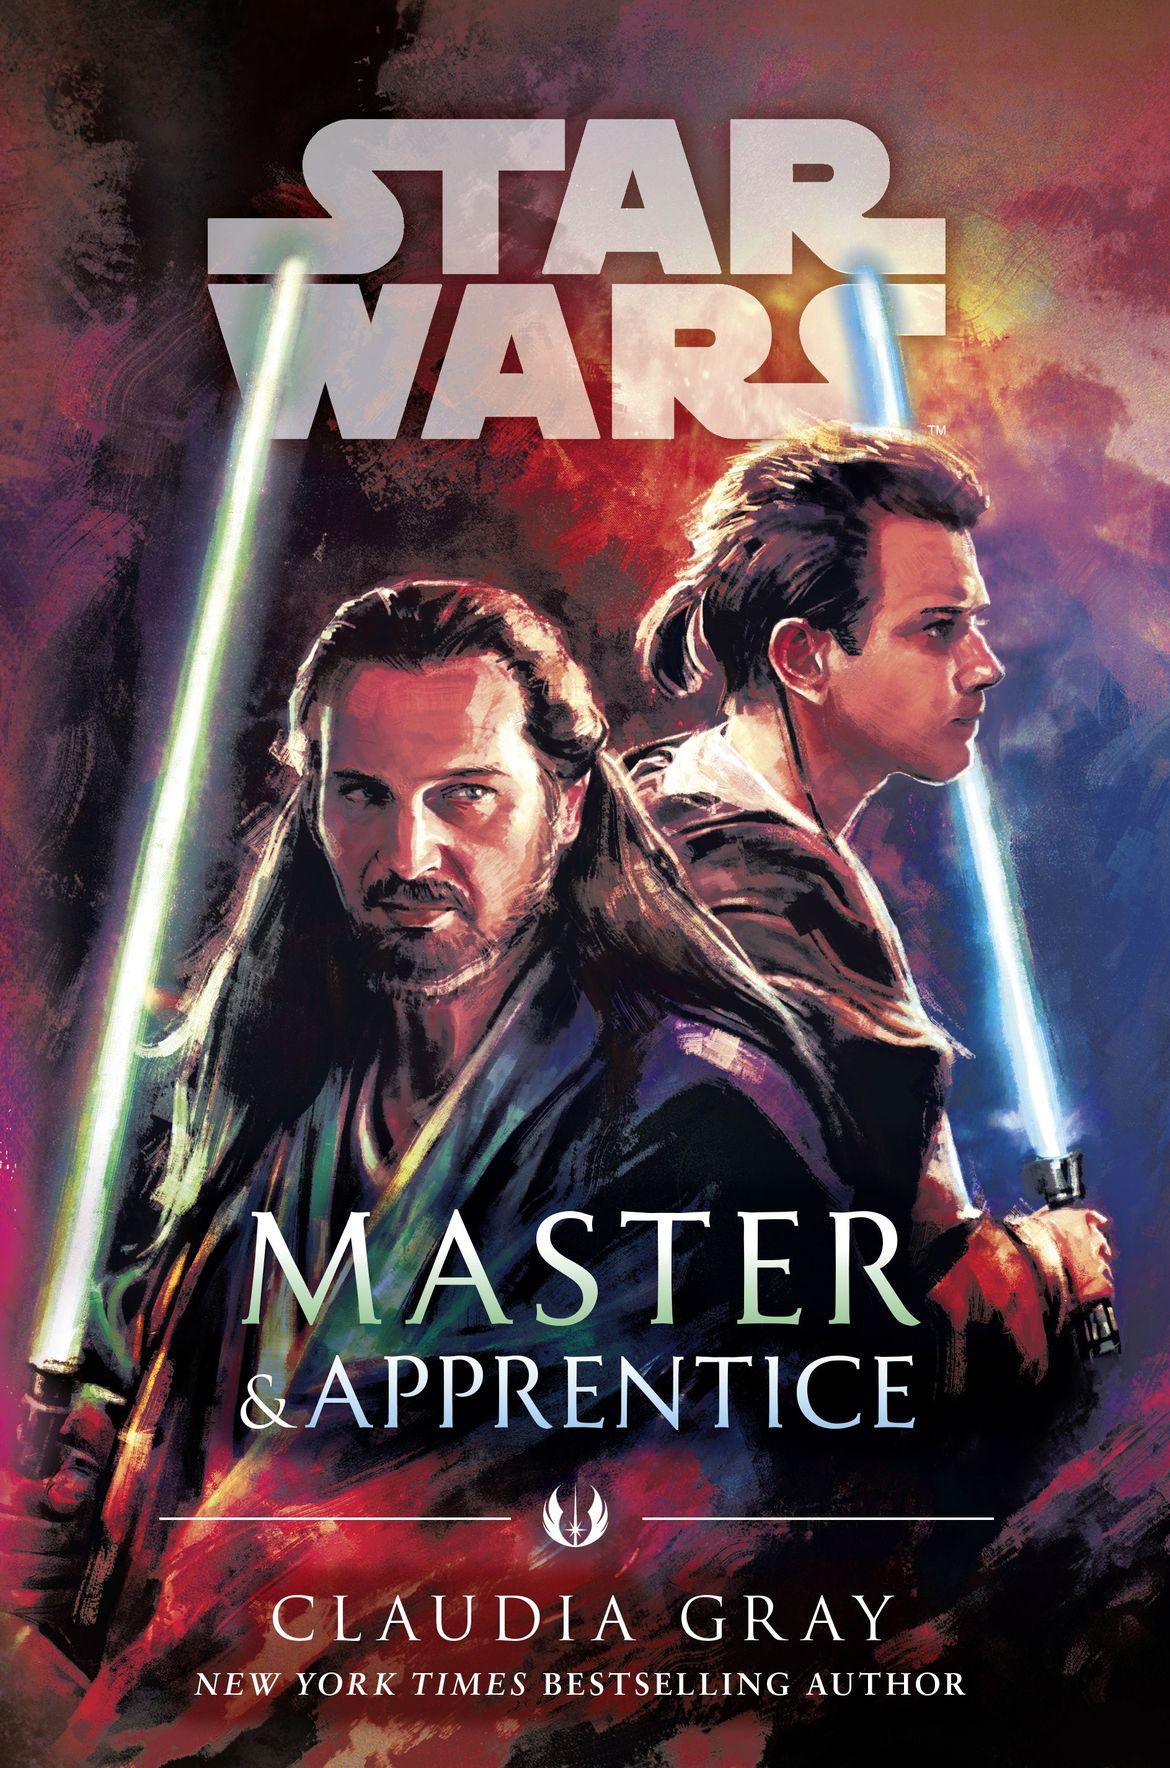 Star Wars: Master & Apprentice by Claudia Gray